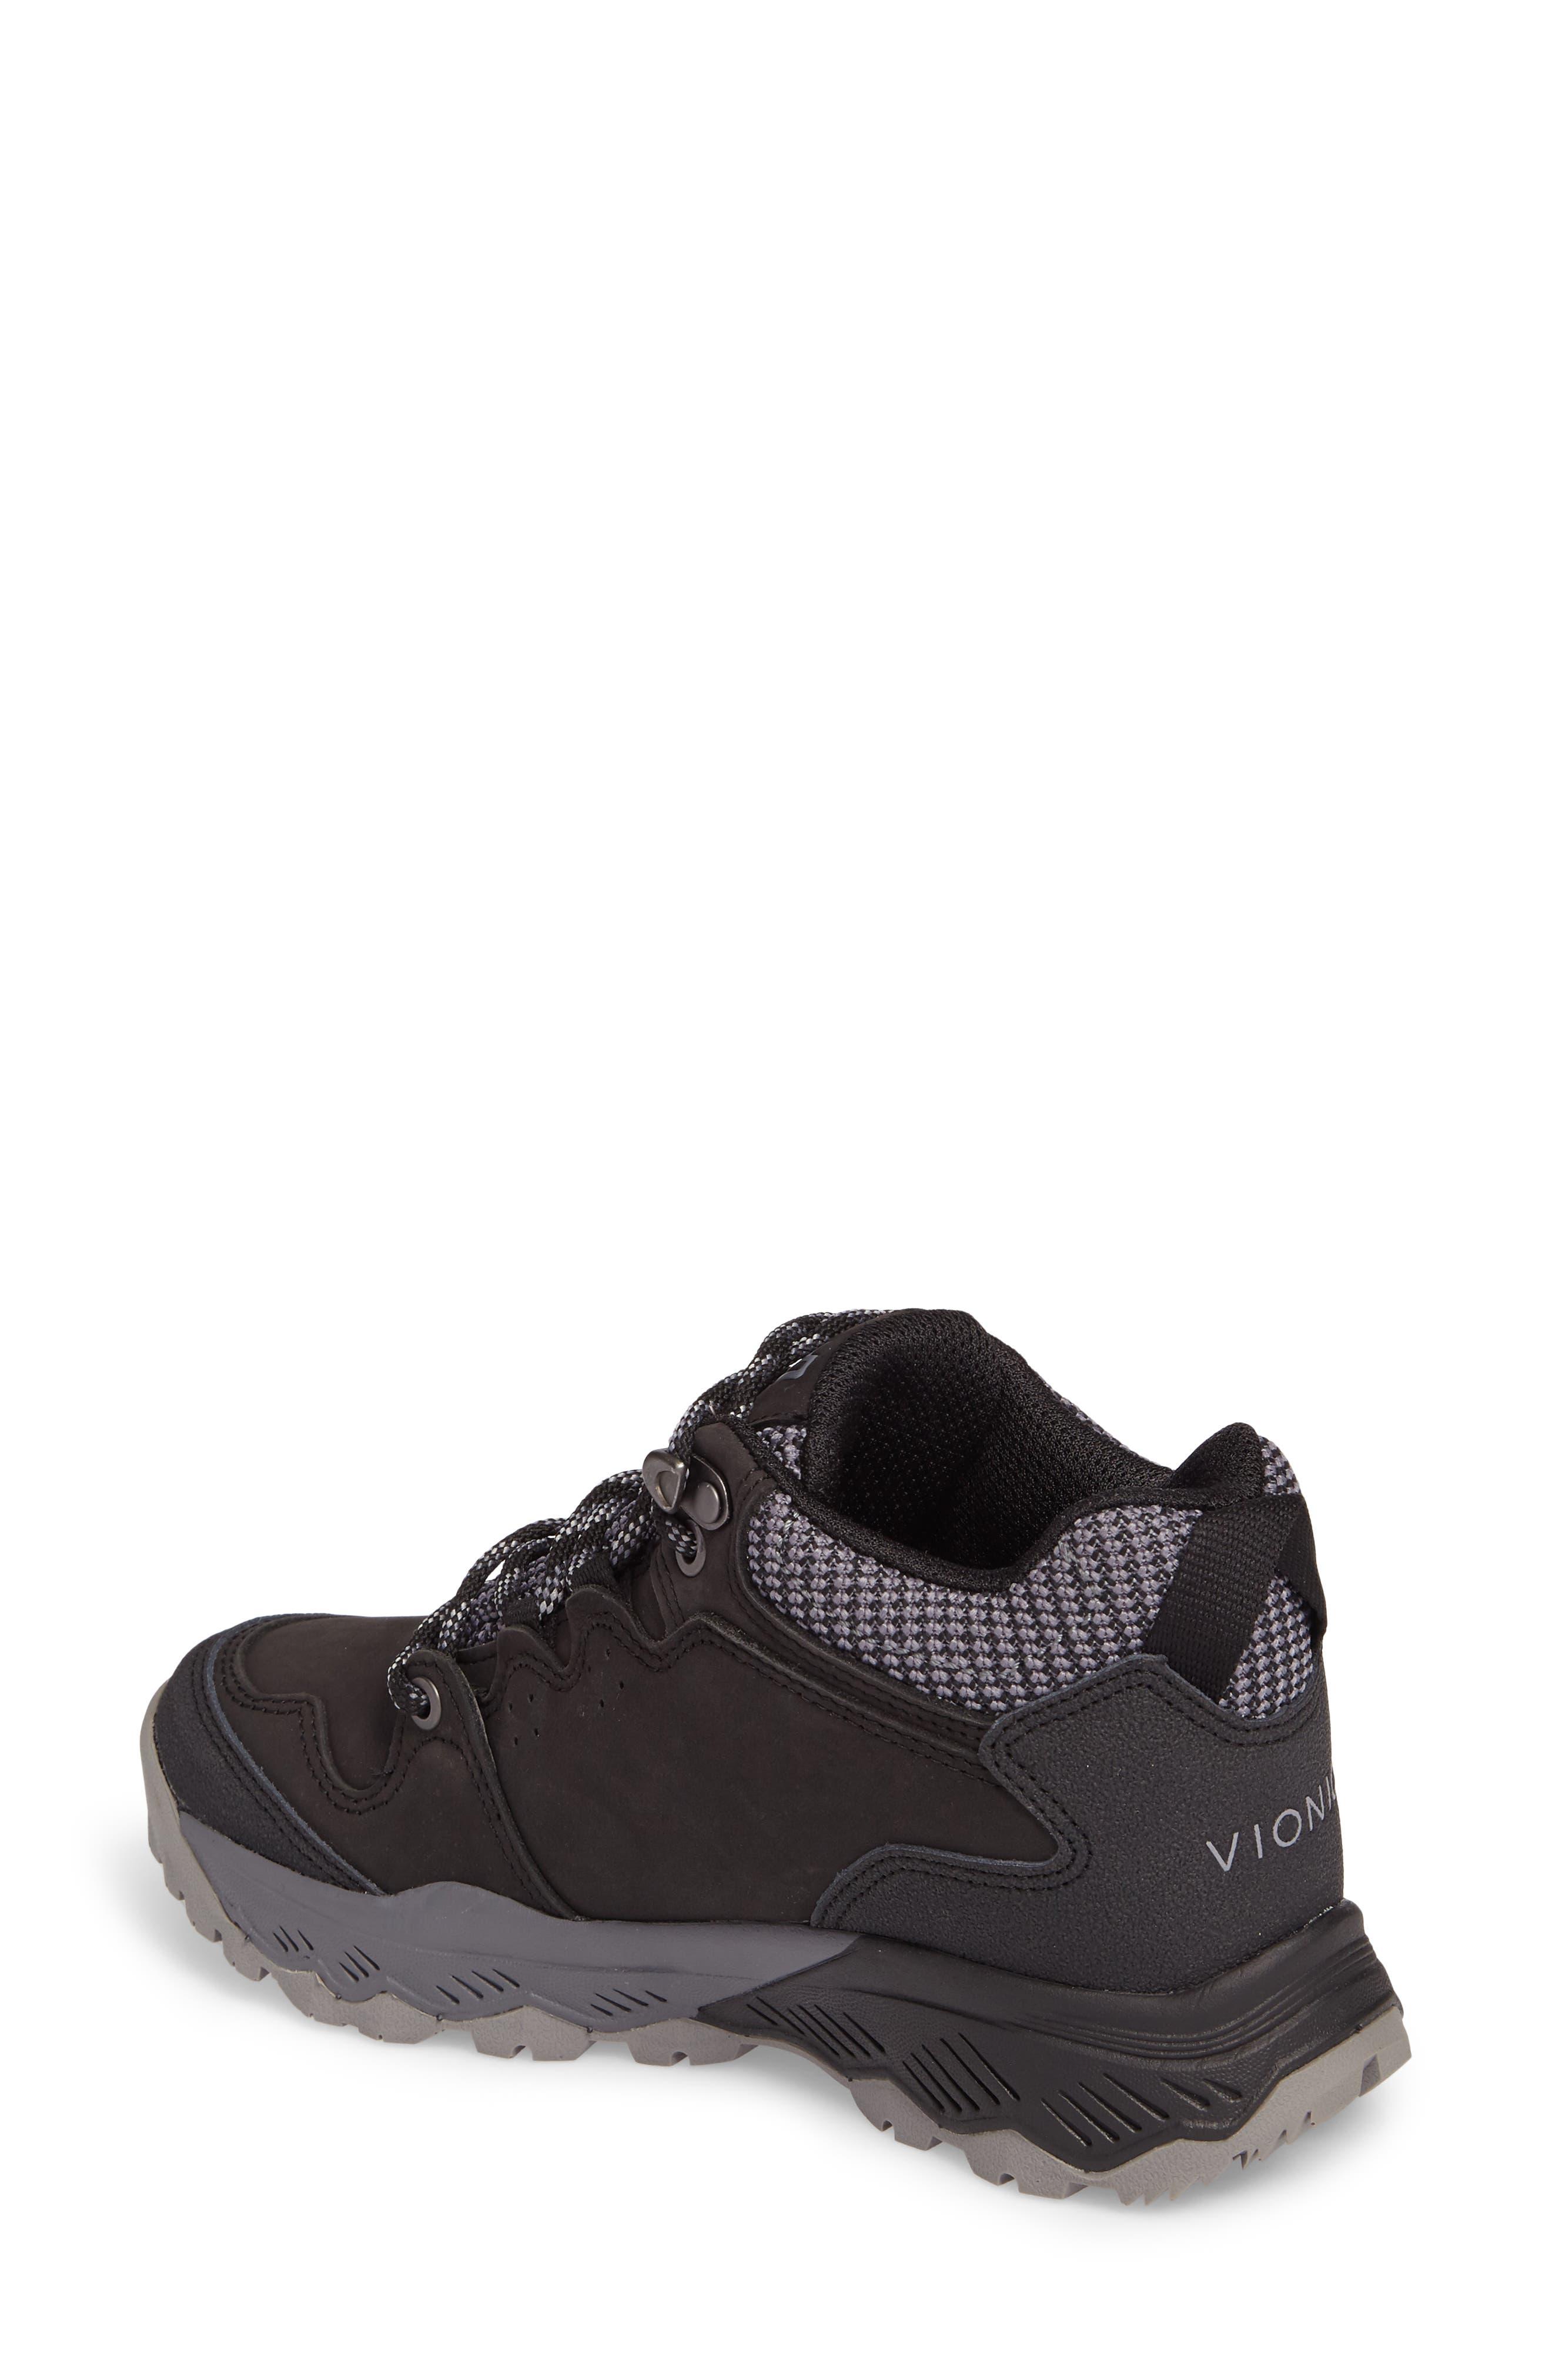 Alternate Image 2  - Vionic Everett Hiking Shoe (Women)